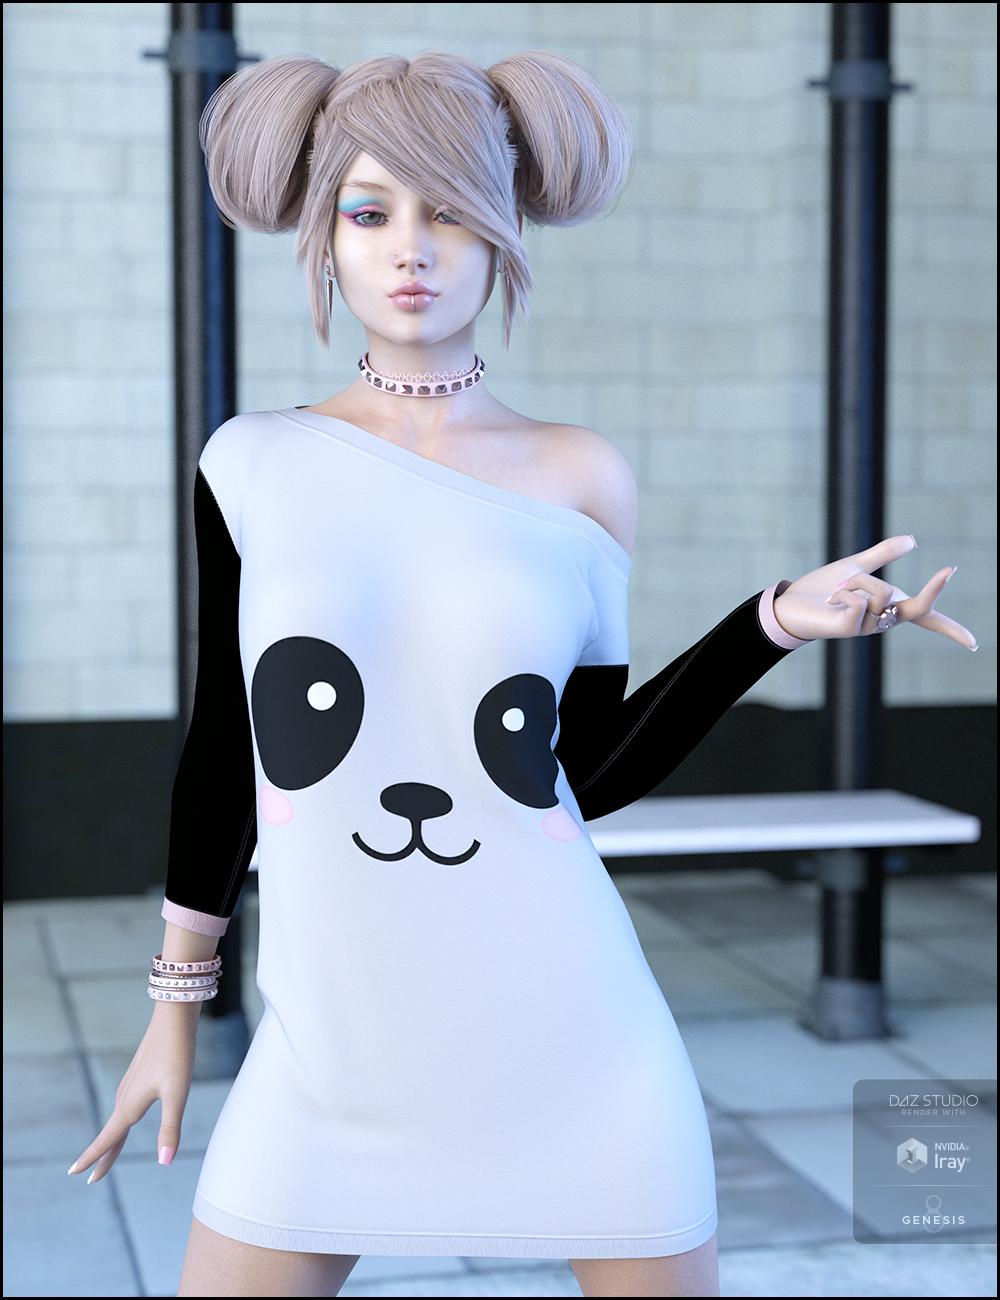 dForce Attitude Dress Kawaii Textures by: JessaiiDemonicaEvilius, 3D Models by Daz 3D